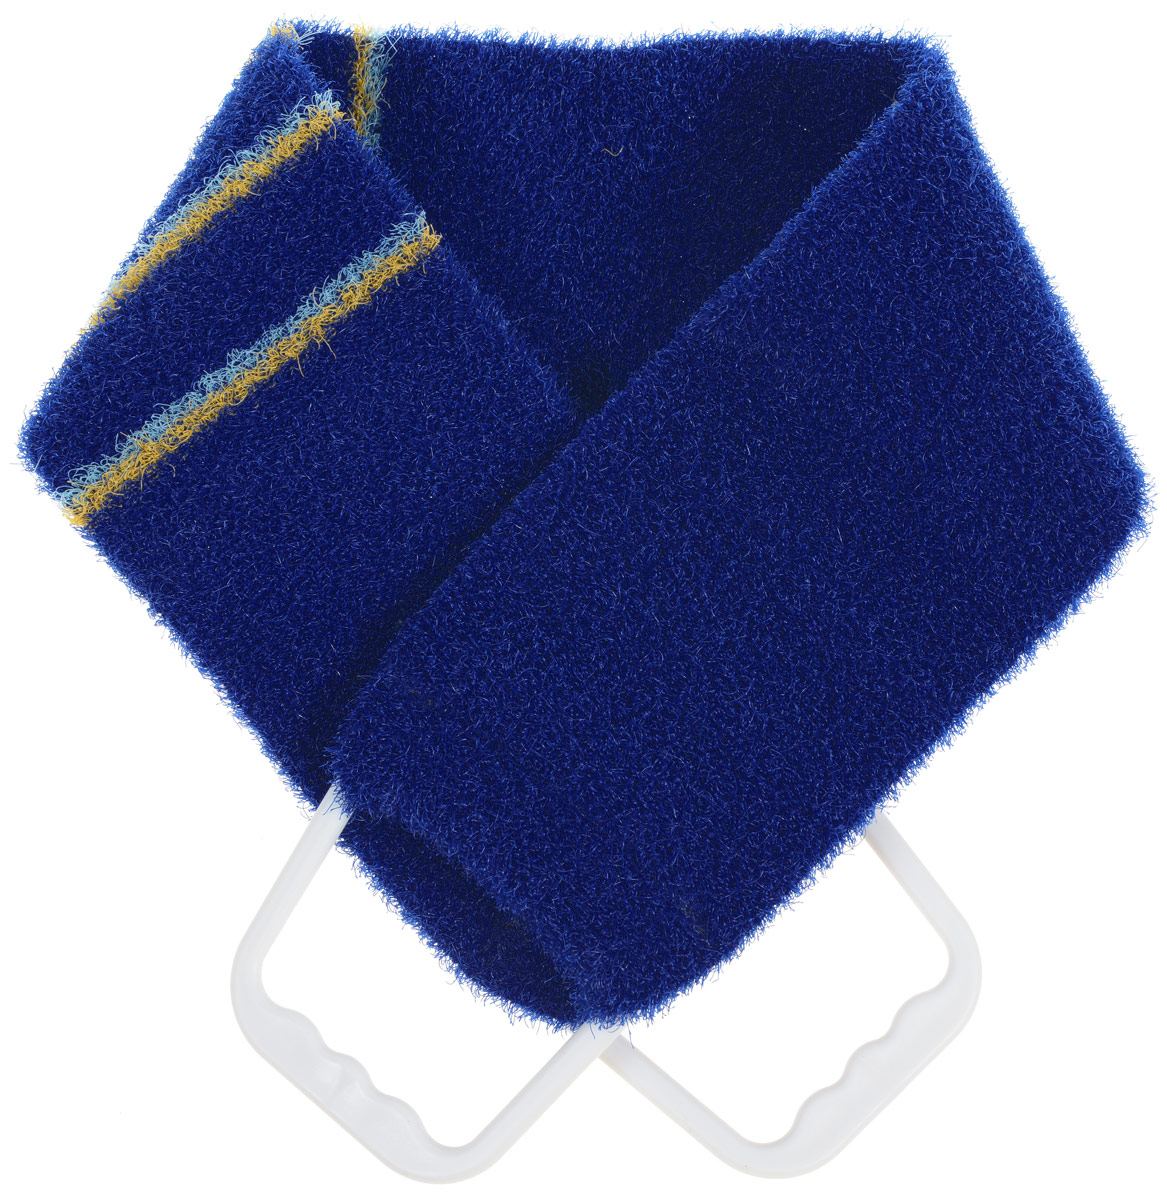 Мочалка-пояс массажная Riffi, жесткая, цвет: темно-синий, 80 х 11 см824_темно-синий